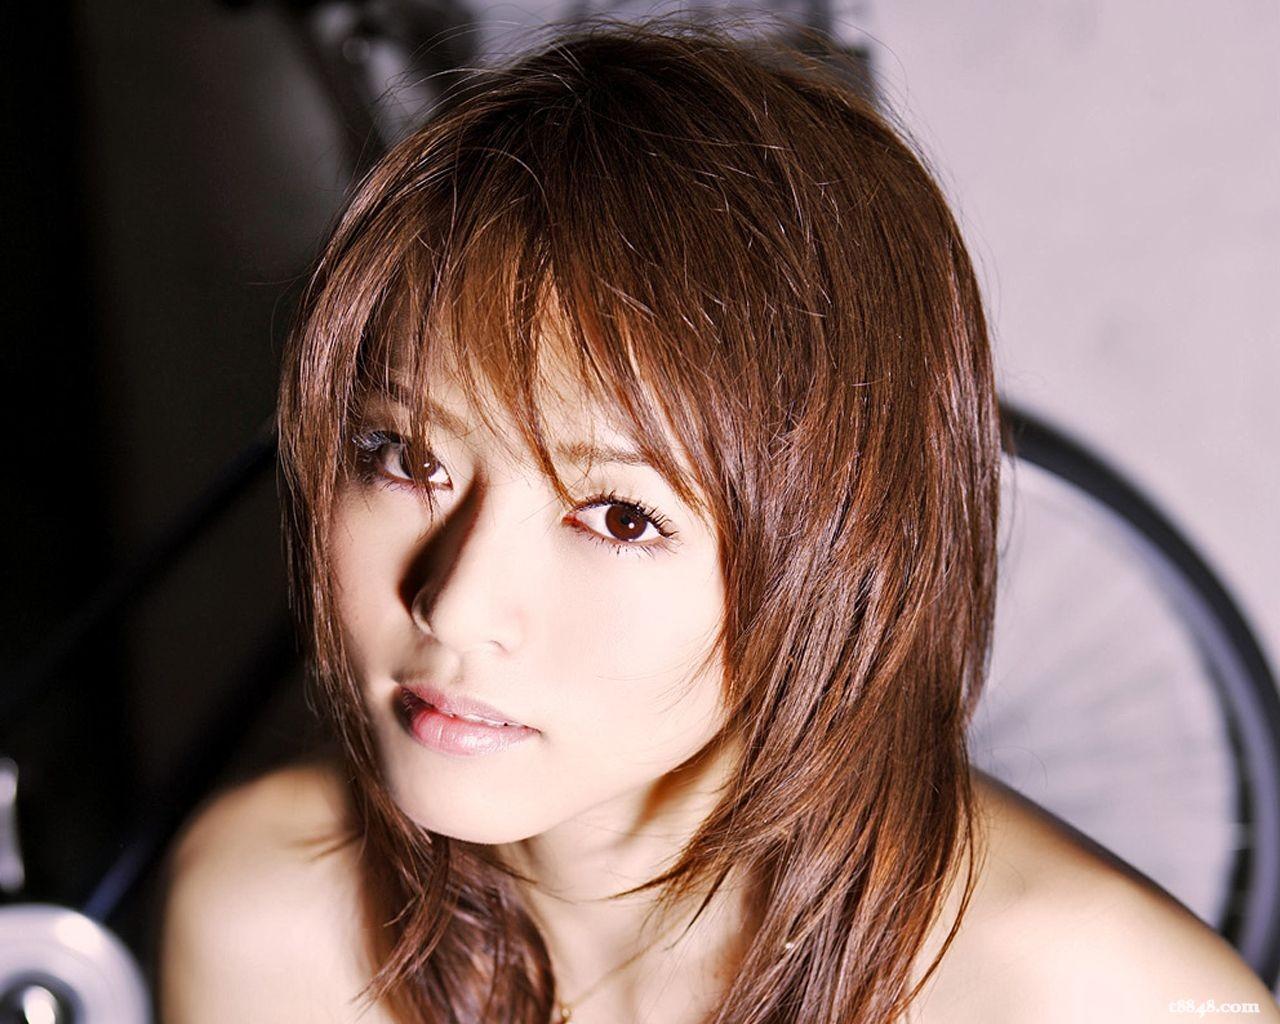 Beschreibung yumiko shaku japanische schönheit wallpaper 14